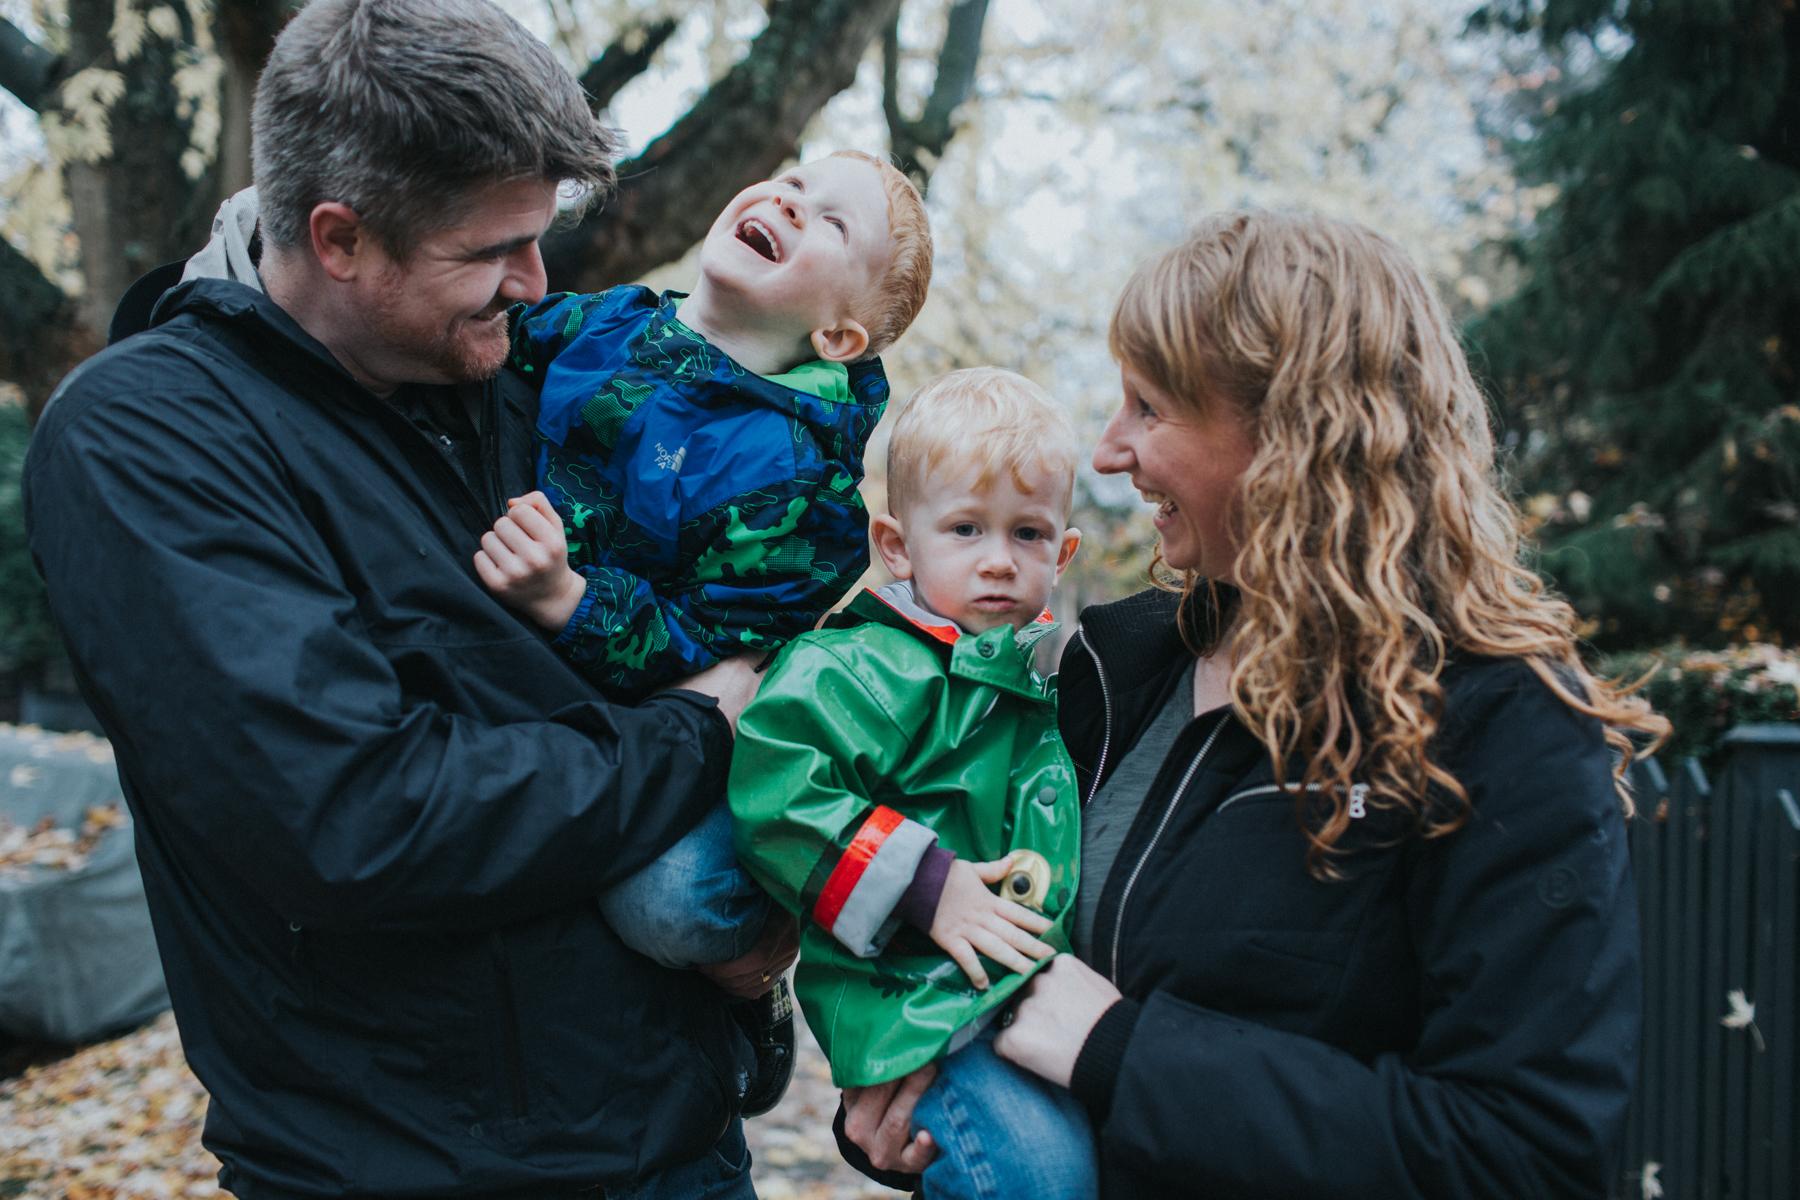 Vancouverfamilyphotography-7817.jpg